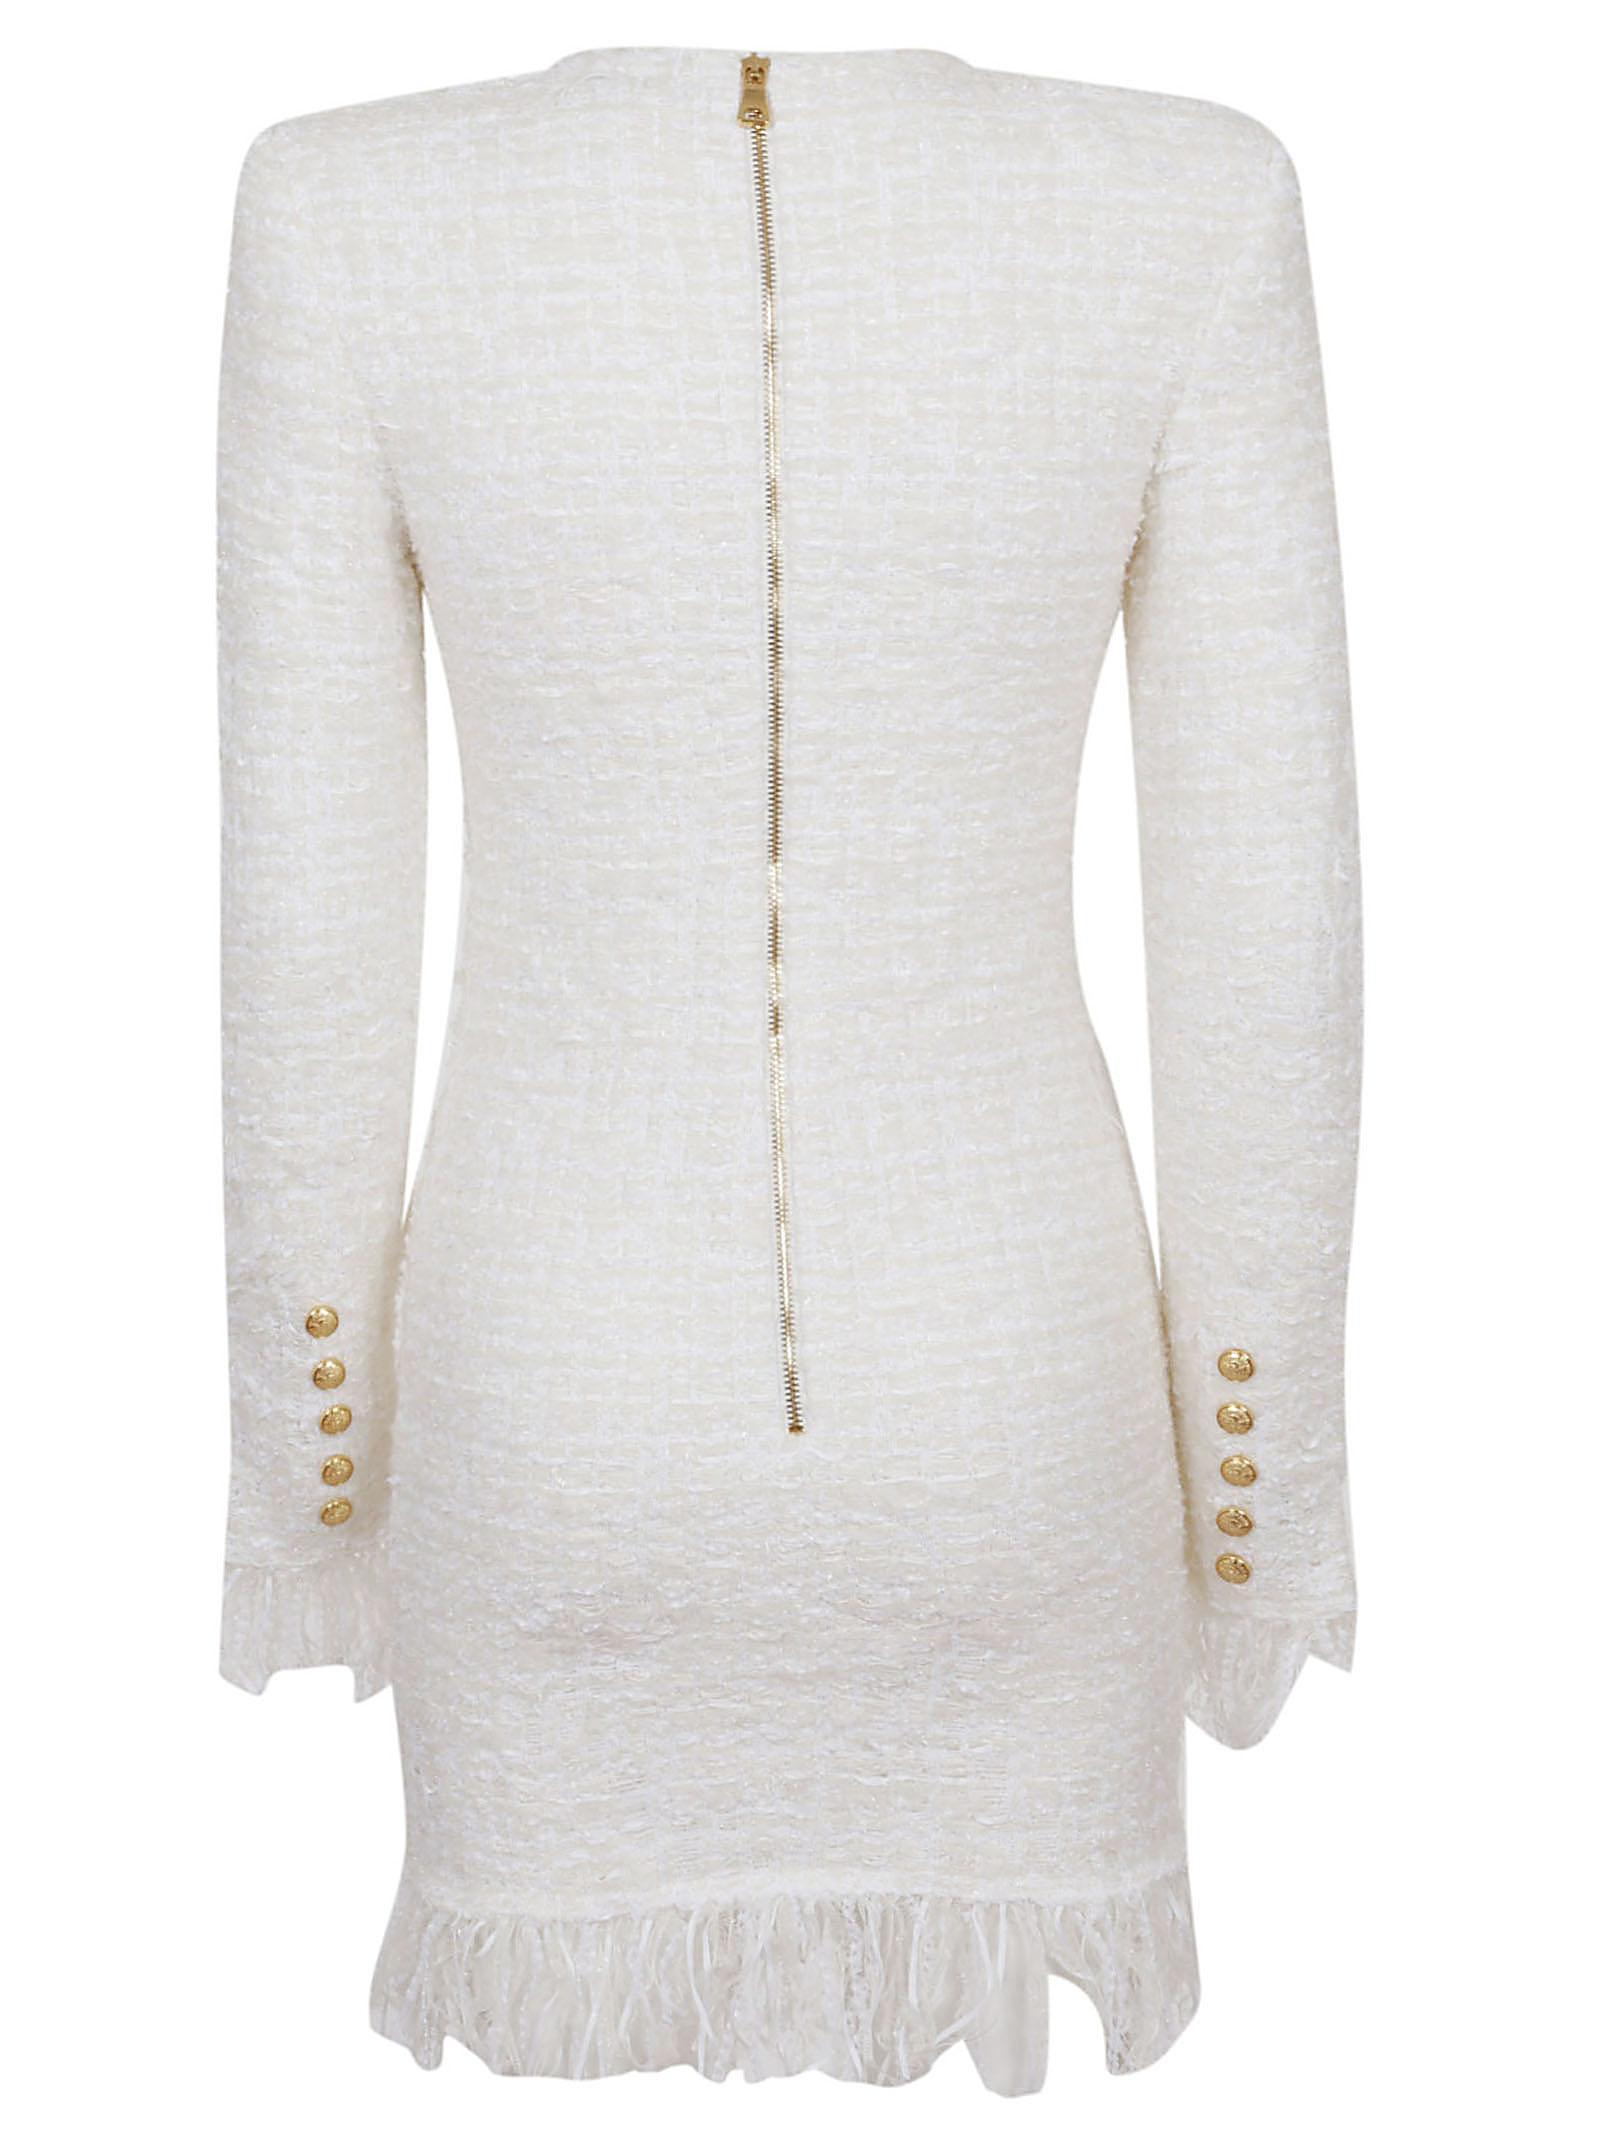 5a69a59f Lyst - Balmain Short Ls 3 Btn Fringed Tweed Dress in White